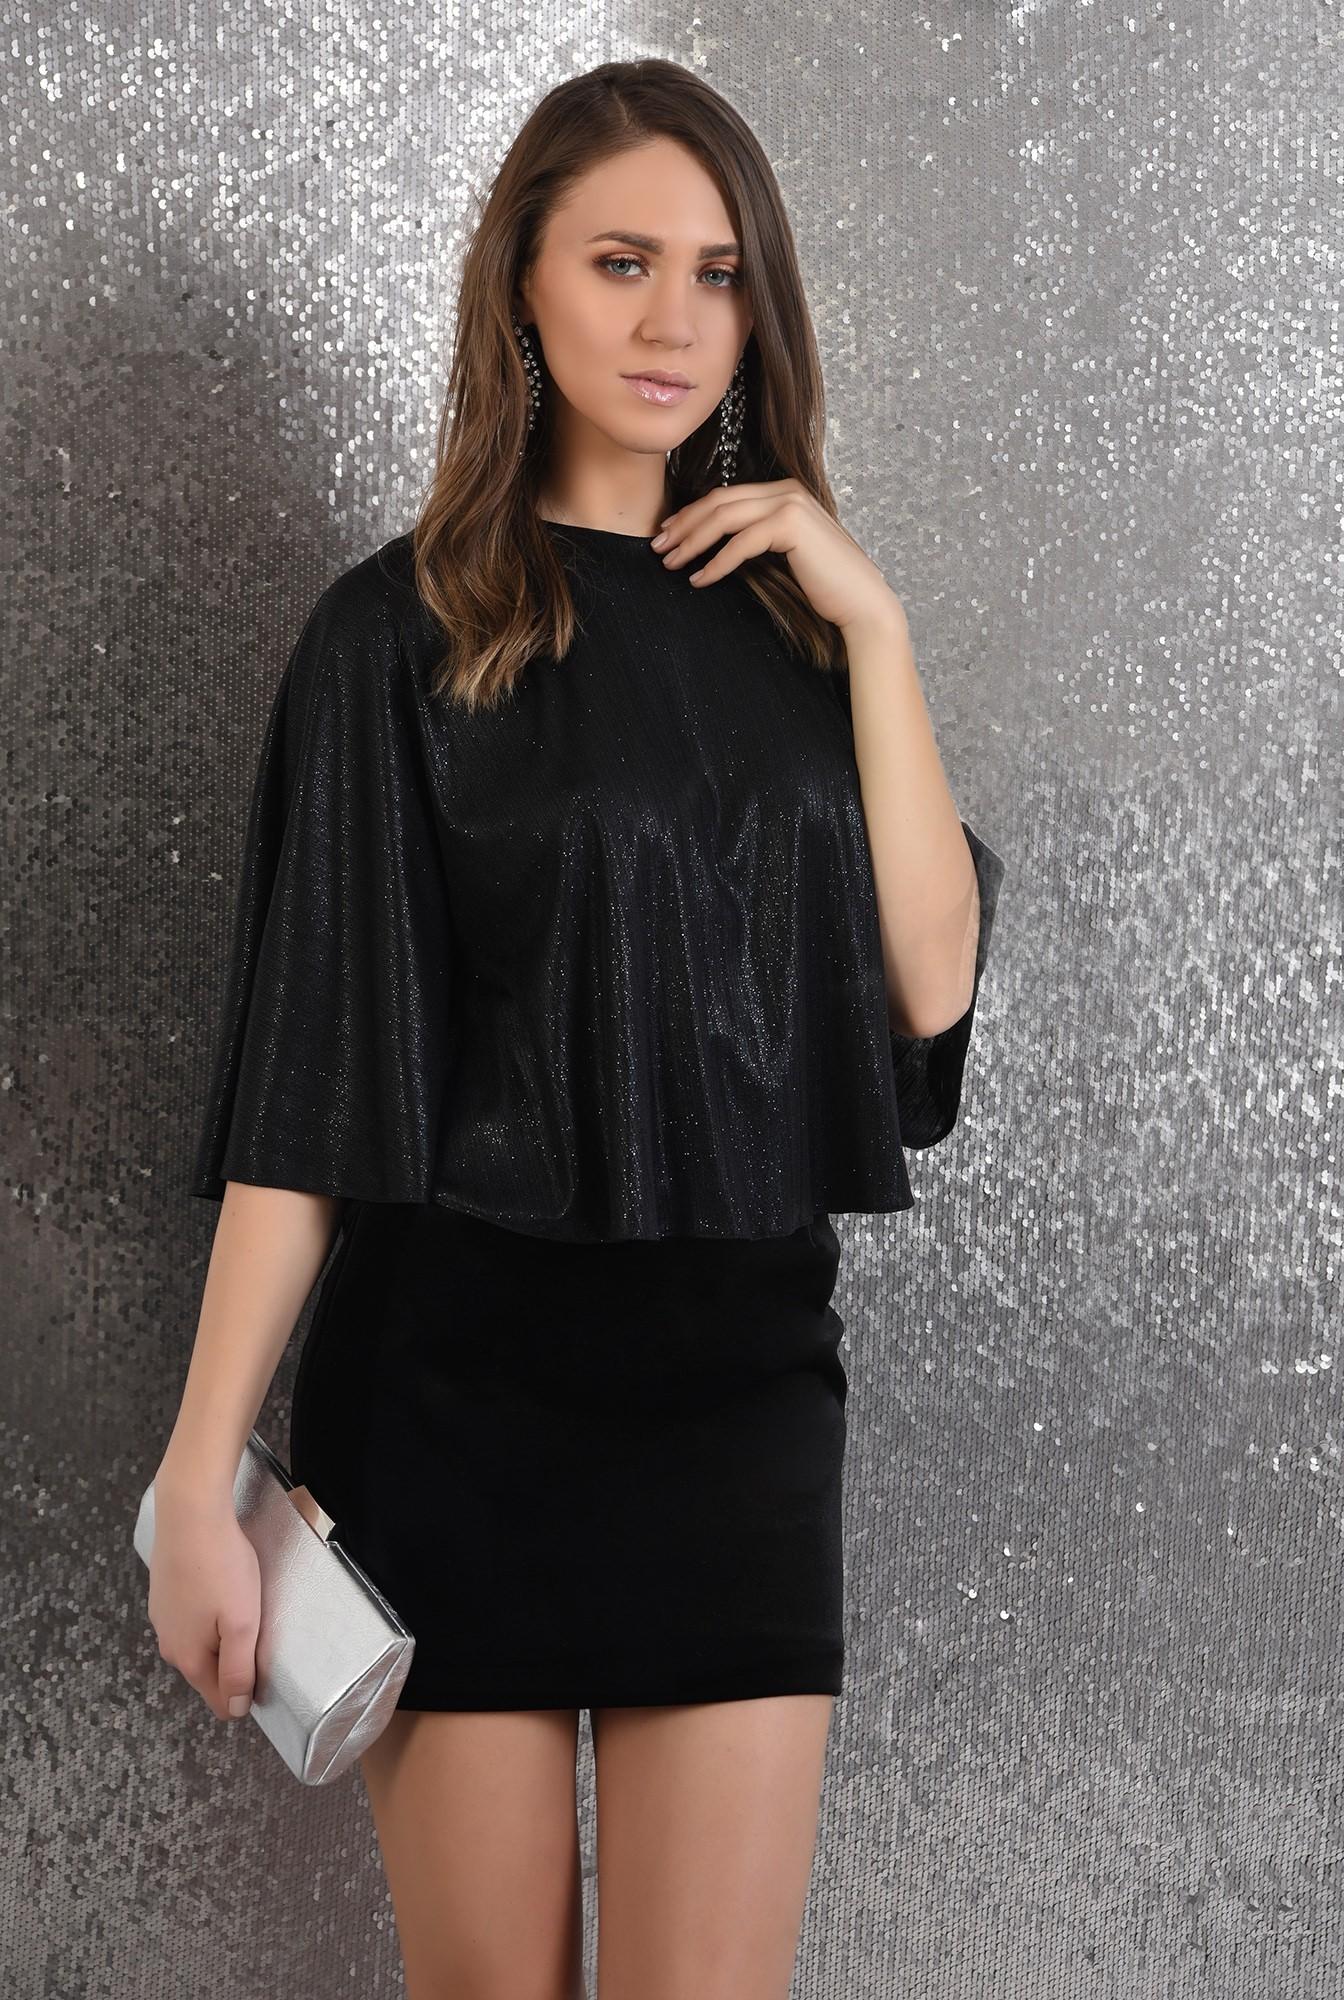 0 -  bluza cu sclipici, eleganta, de seara, neagra, croi evazat larg